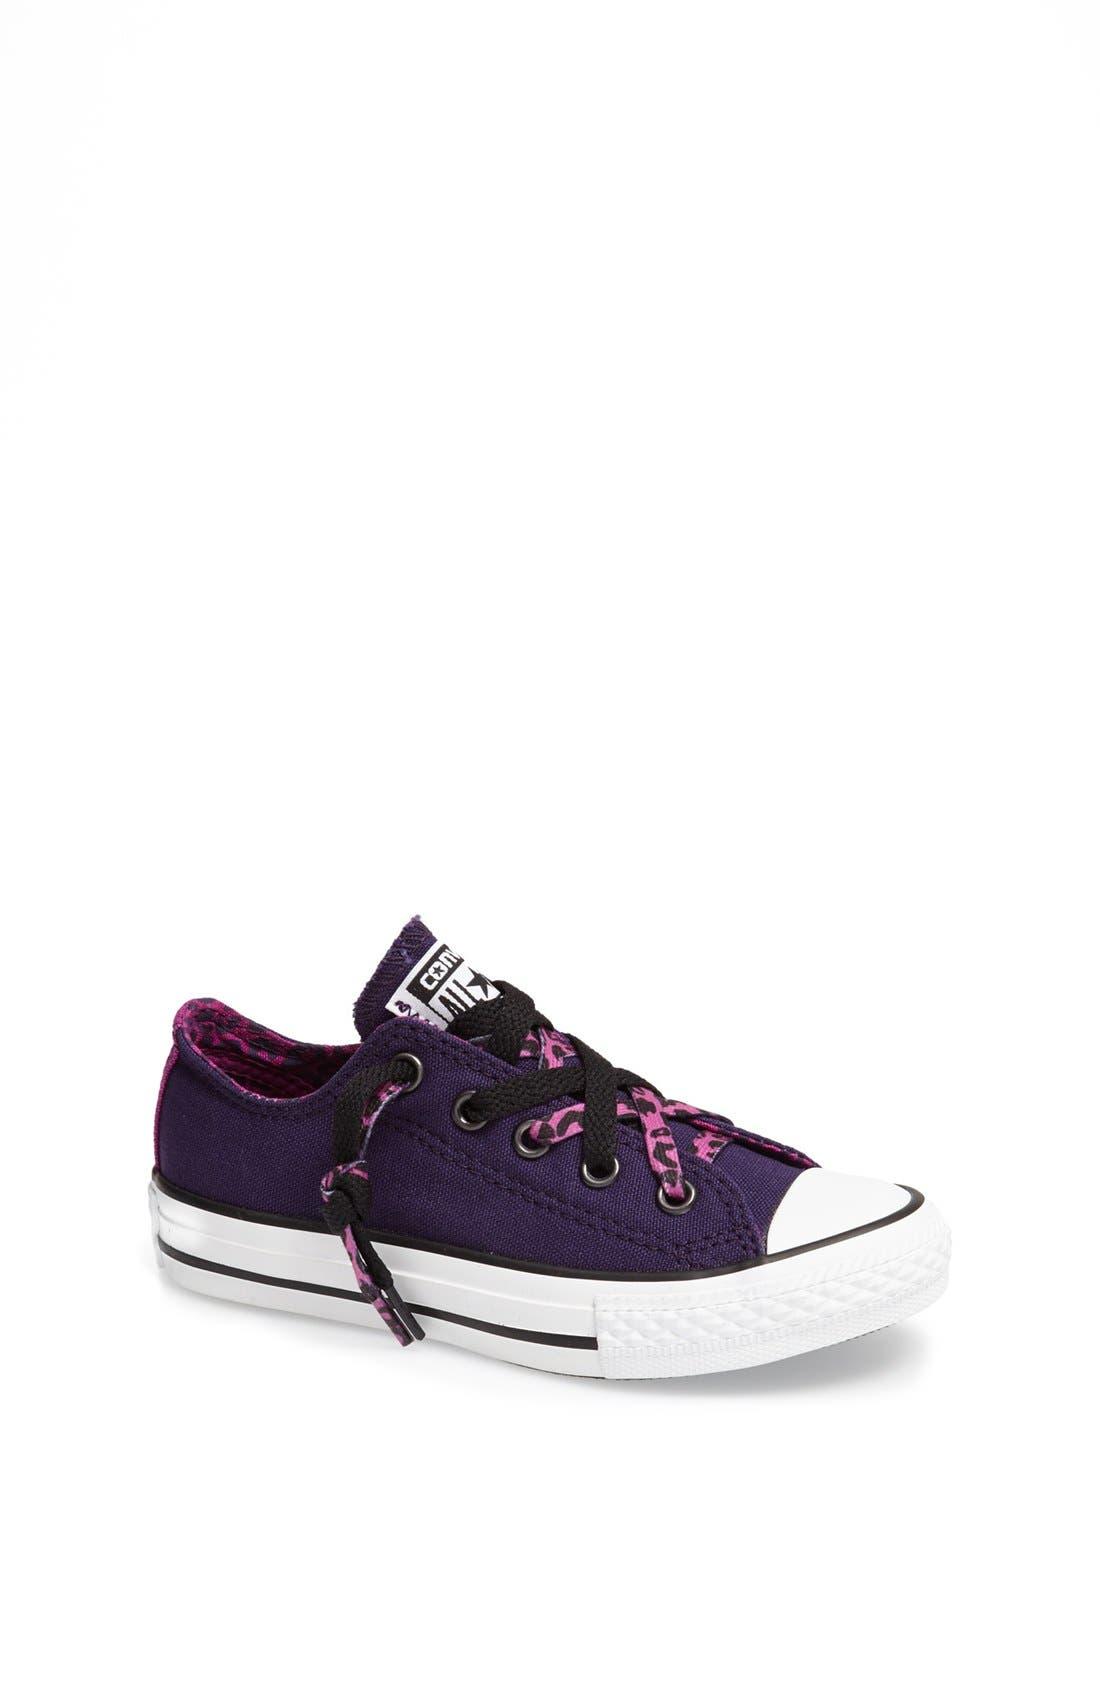 Alternate Image 1 Selected - Converse Chuck Taylor® All Star® 'Kriss N Kross' Sneaker (Toddler, Little Kid & Big Kid)